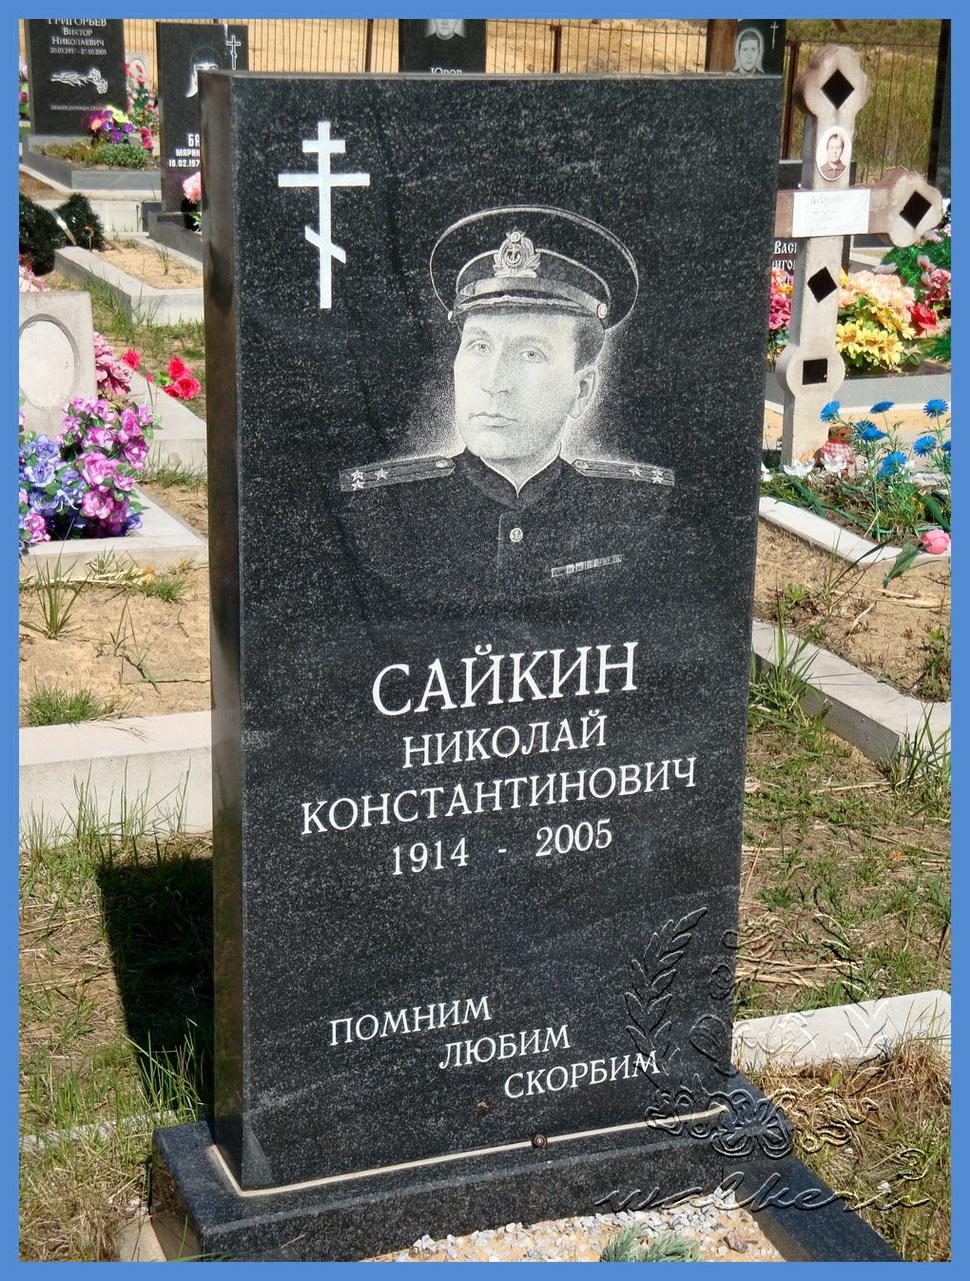 Сайкин Николай Константинович